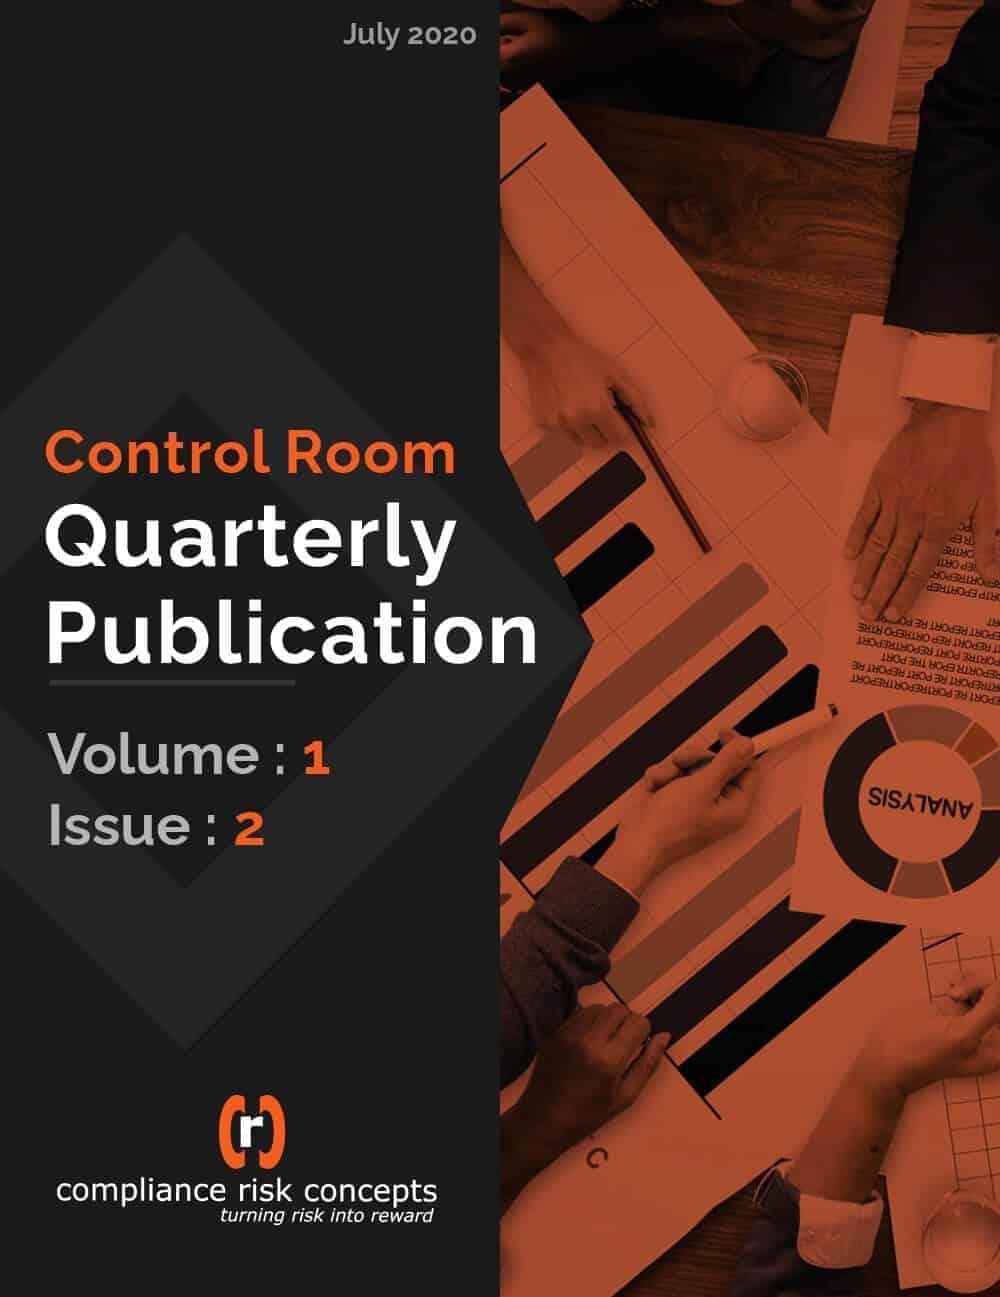 controlroom-publication-vol-1-issue-2-2 (1)